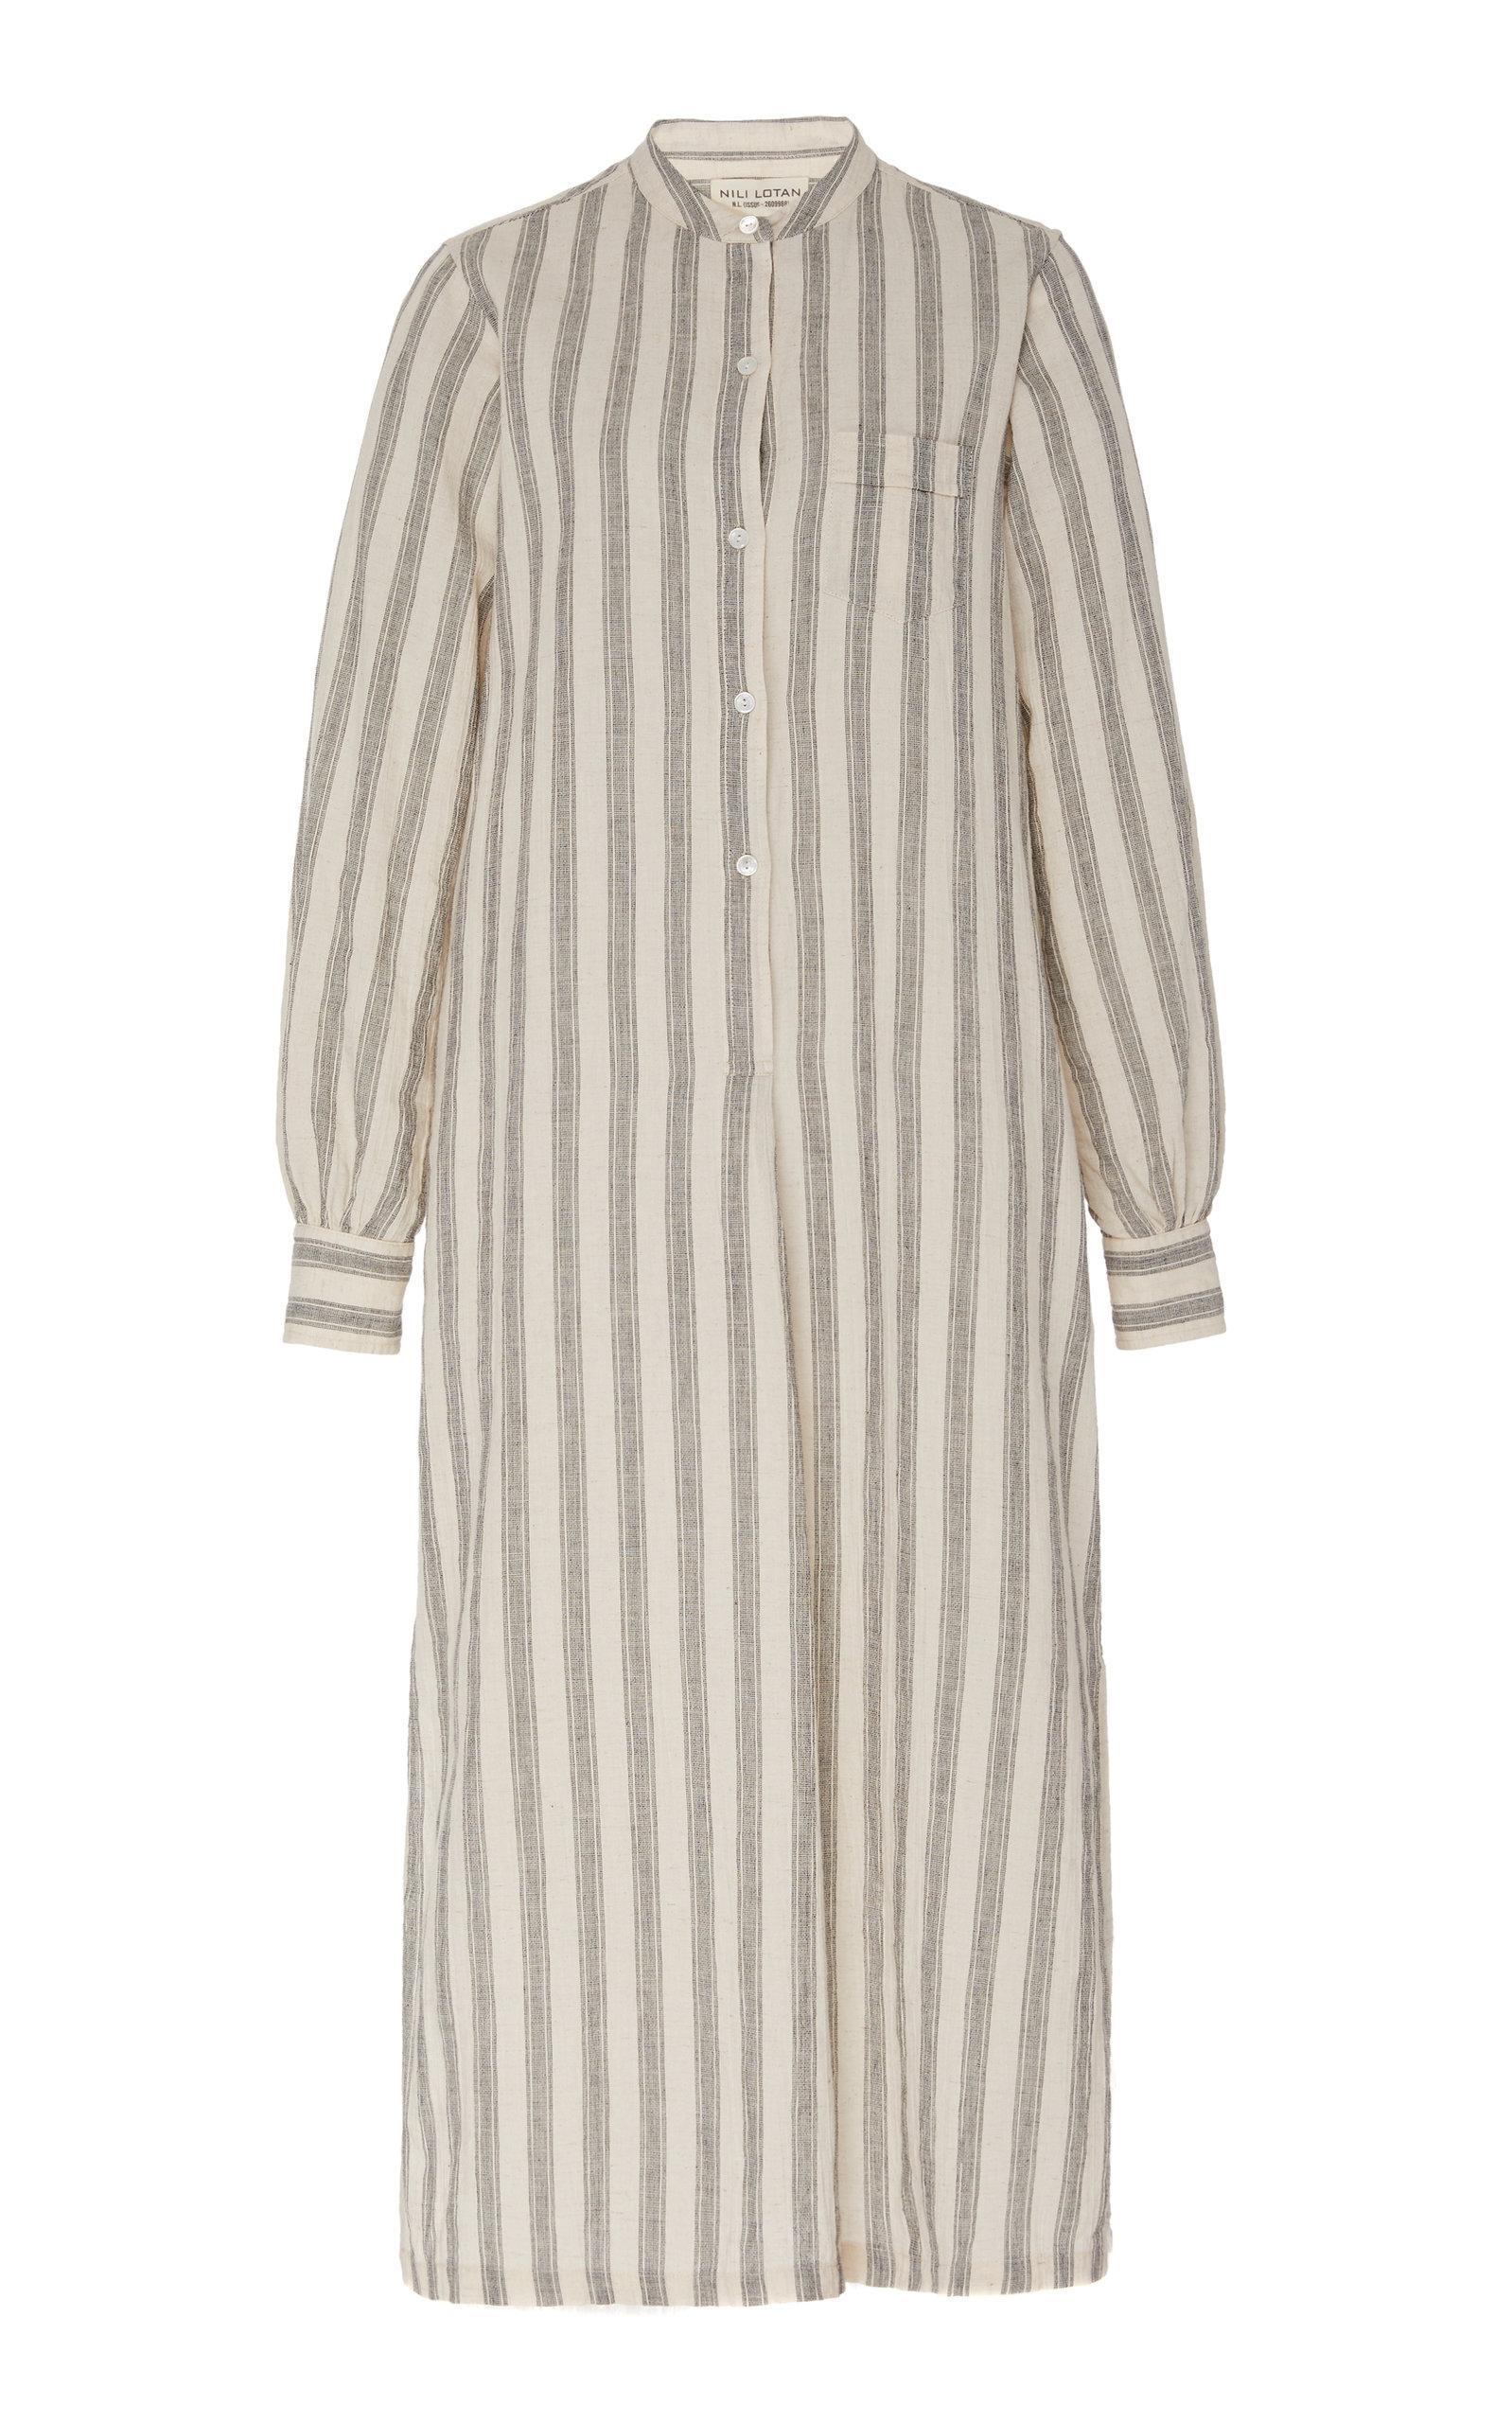 Buy NILI LOTAN Malia Striped Cotton-Blend Midi Dress online, shop NILI LOTAN at the best price